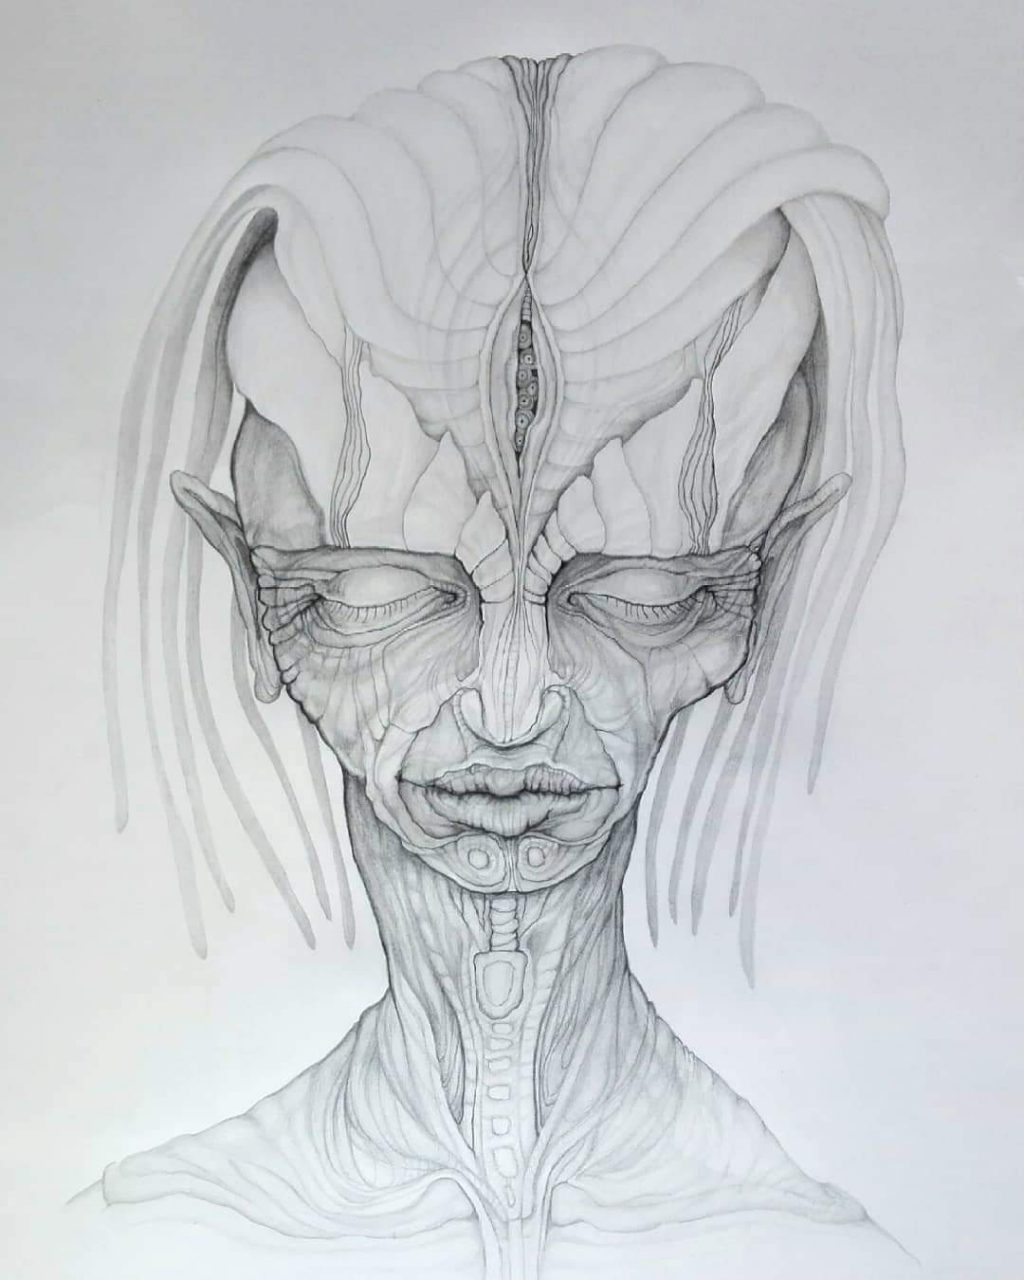 2019, 70 x 50 cm, pencil drawing